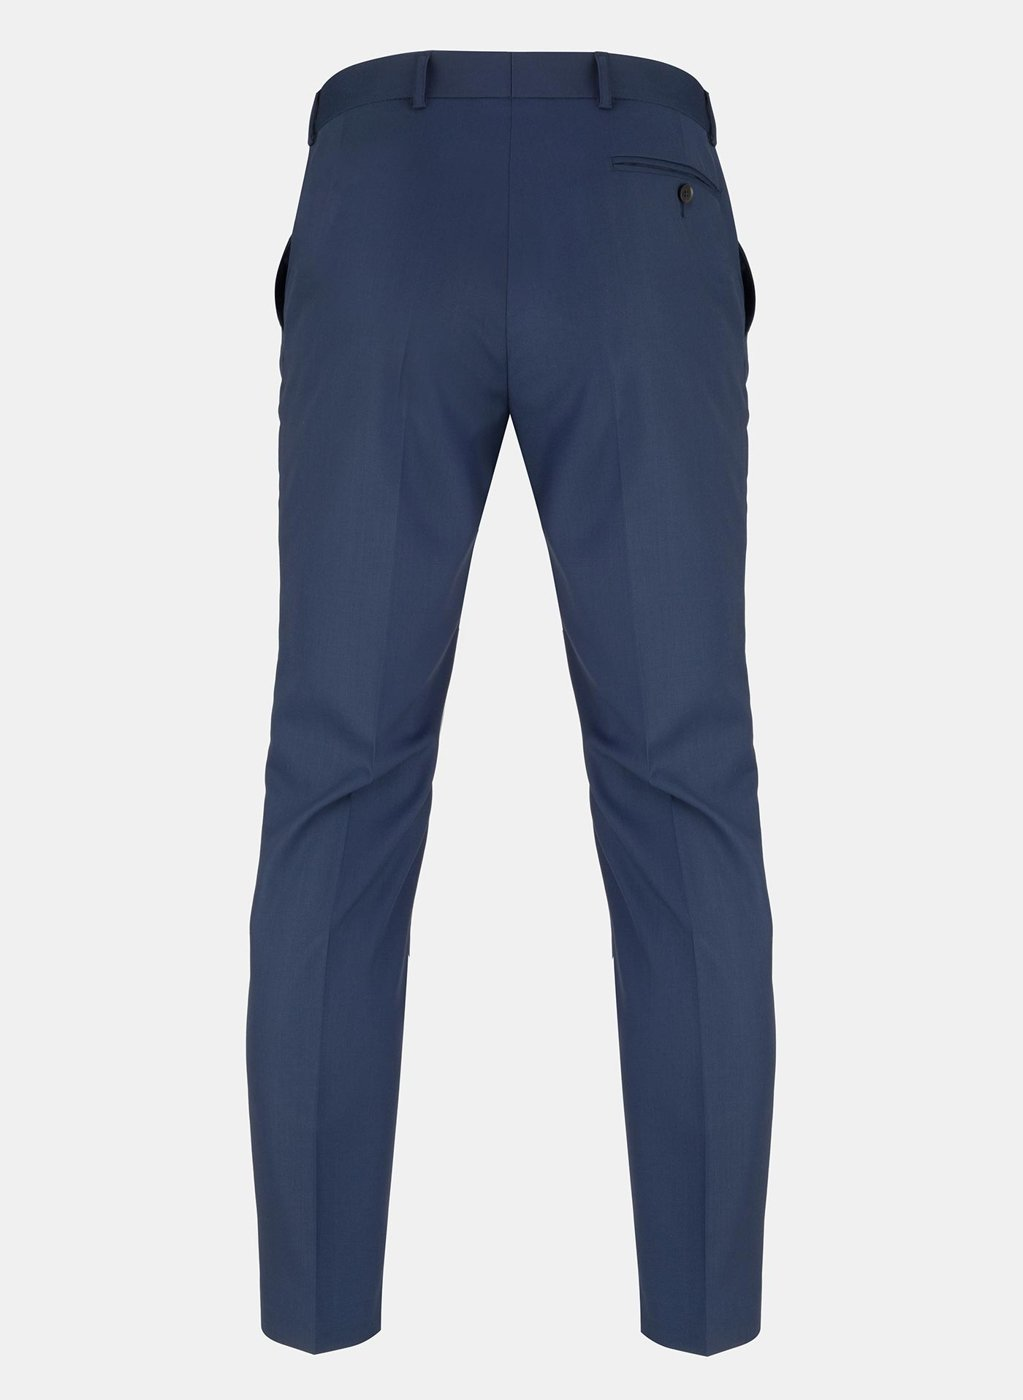 Spodnie męskie garniturowe TANTO PLM-6G-247-N